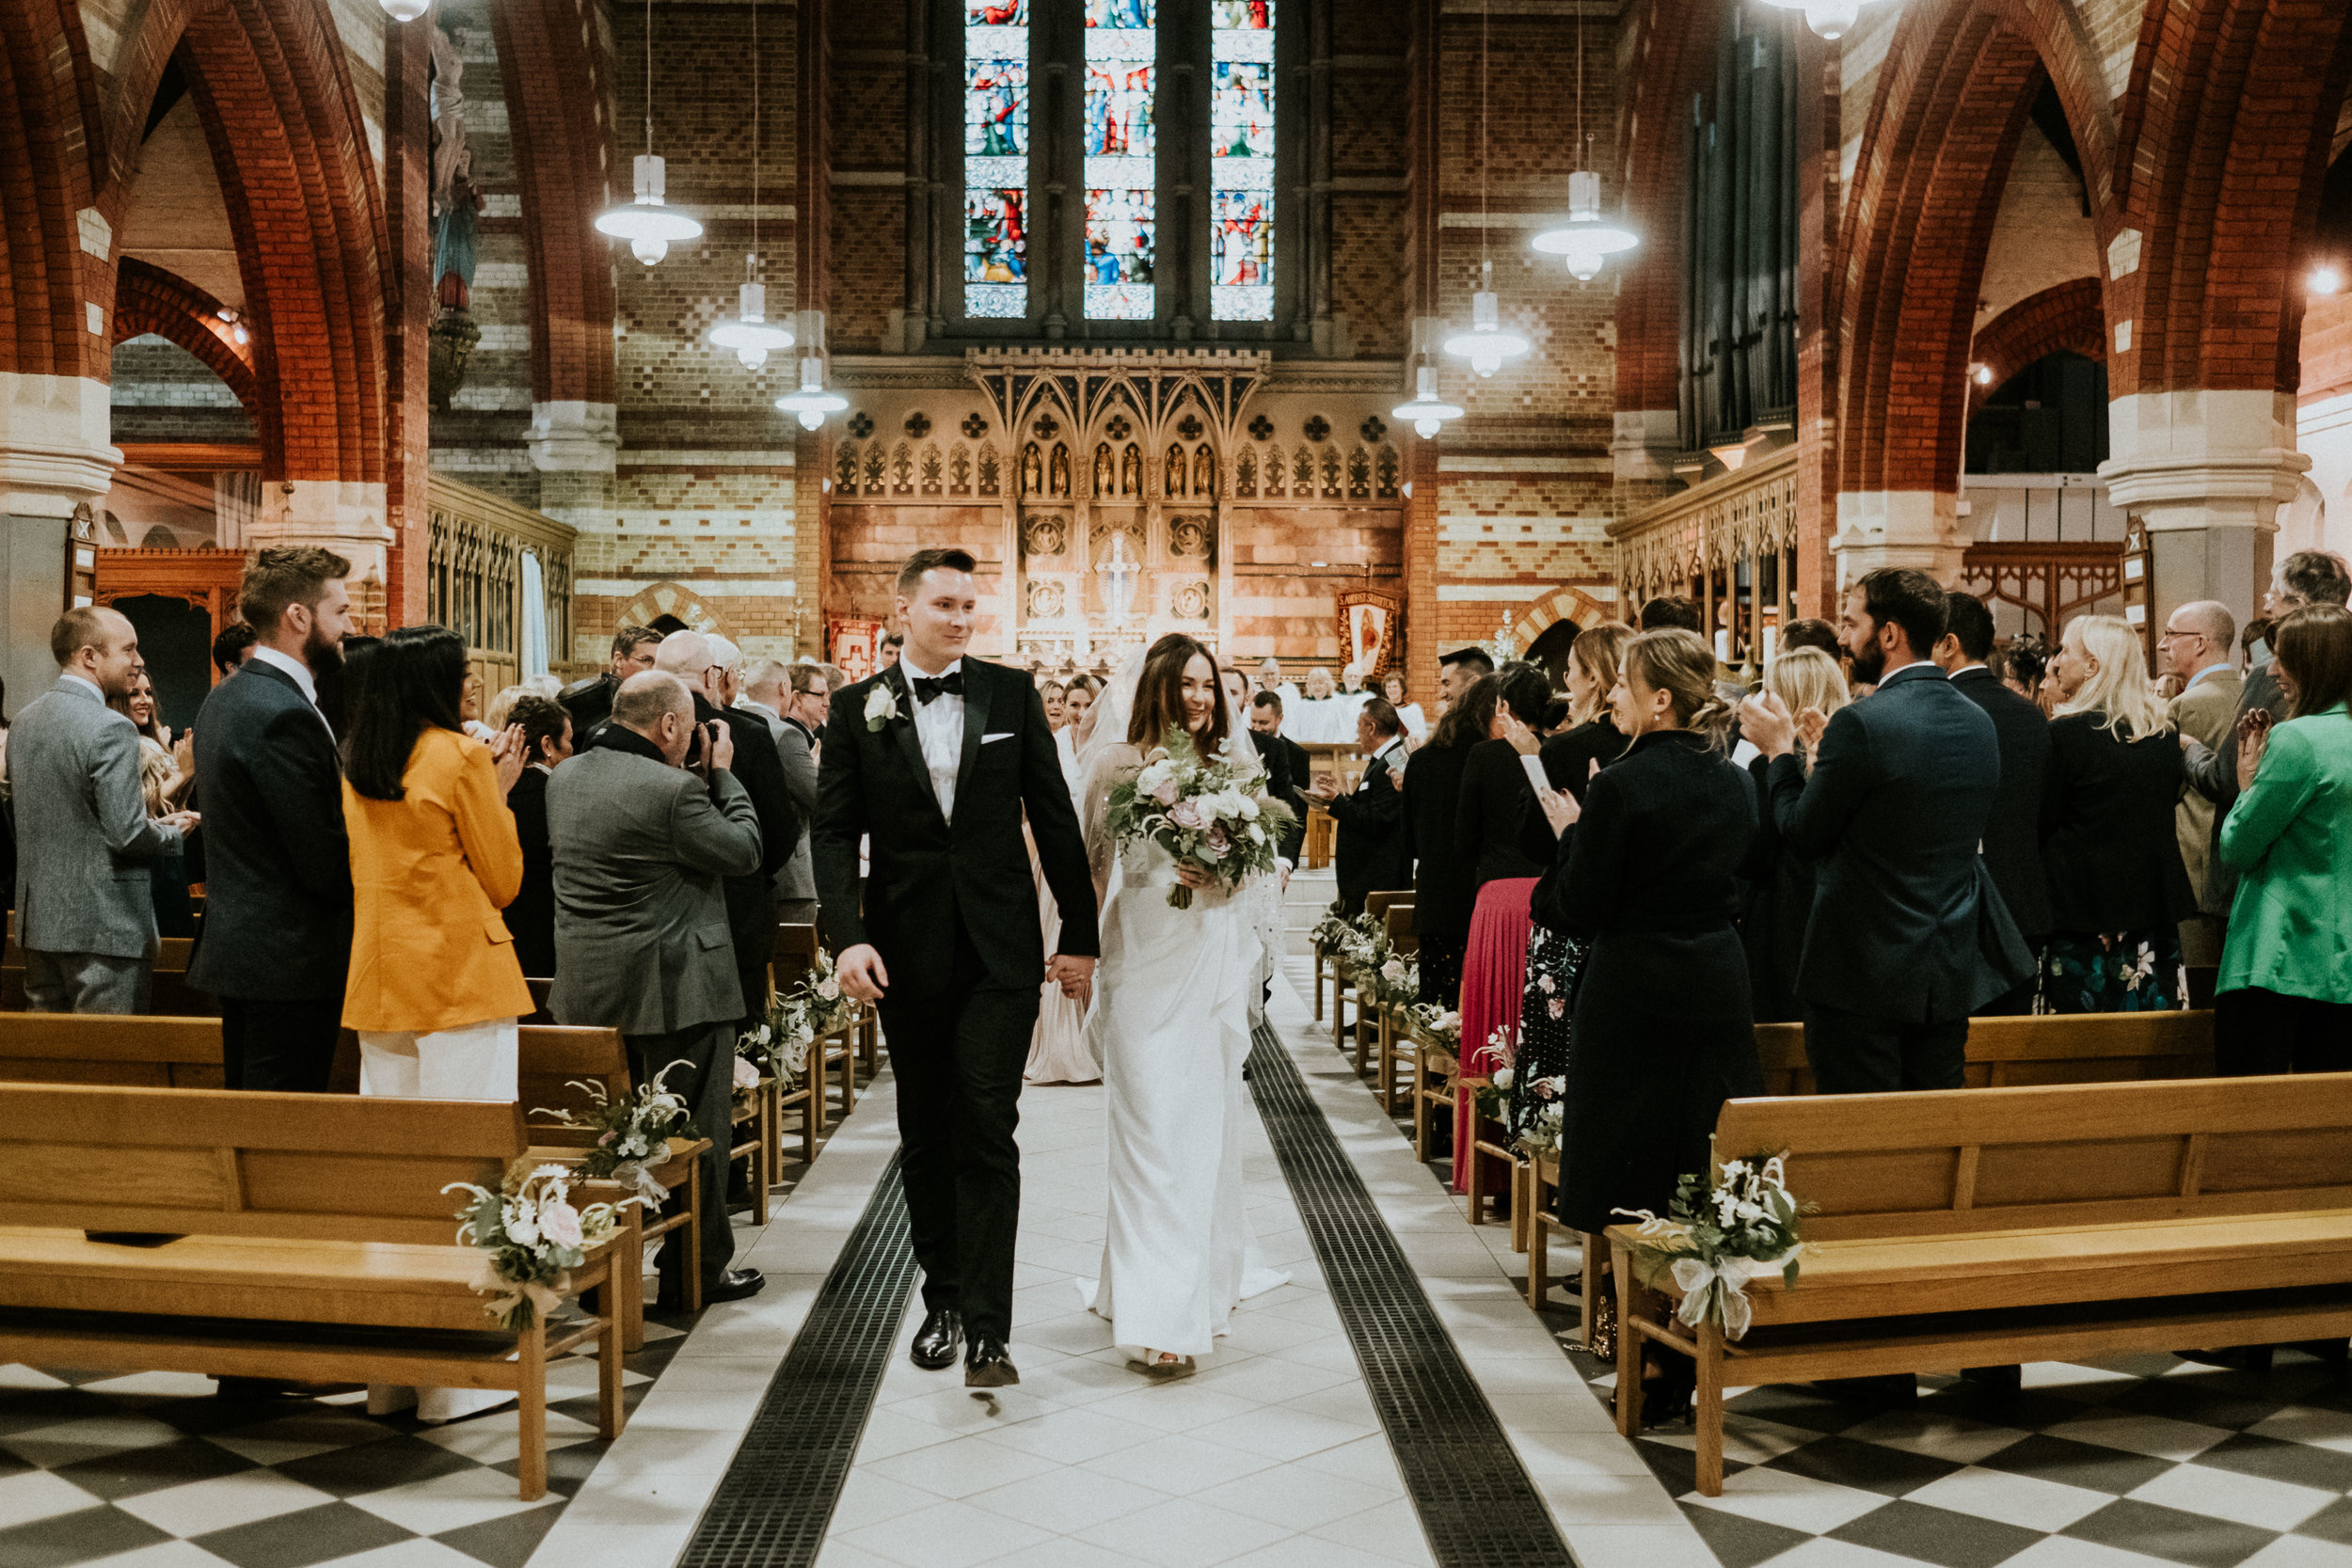 Lottie_Teddington_wedding_flowers_church2.jpg